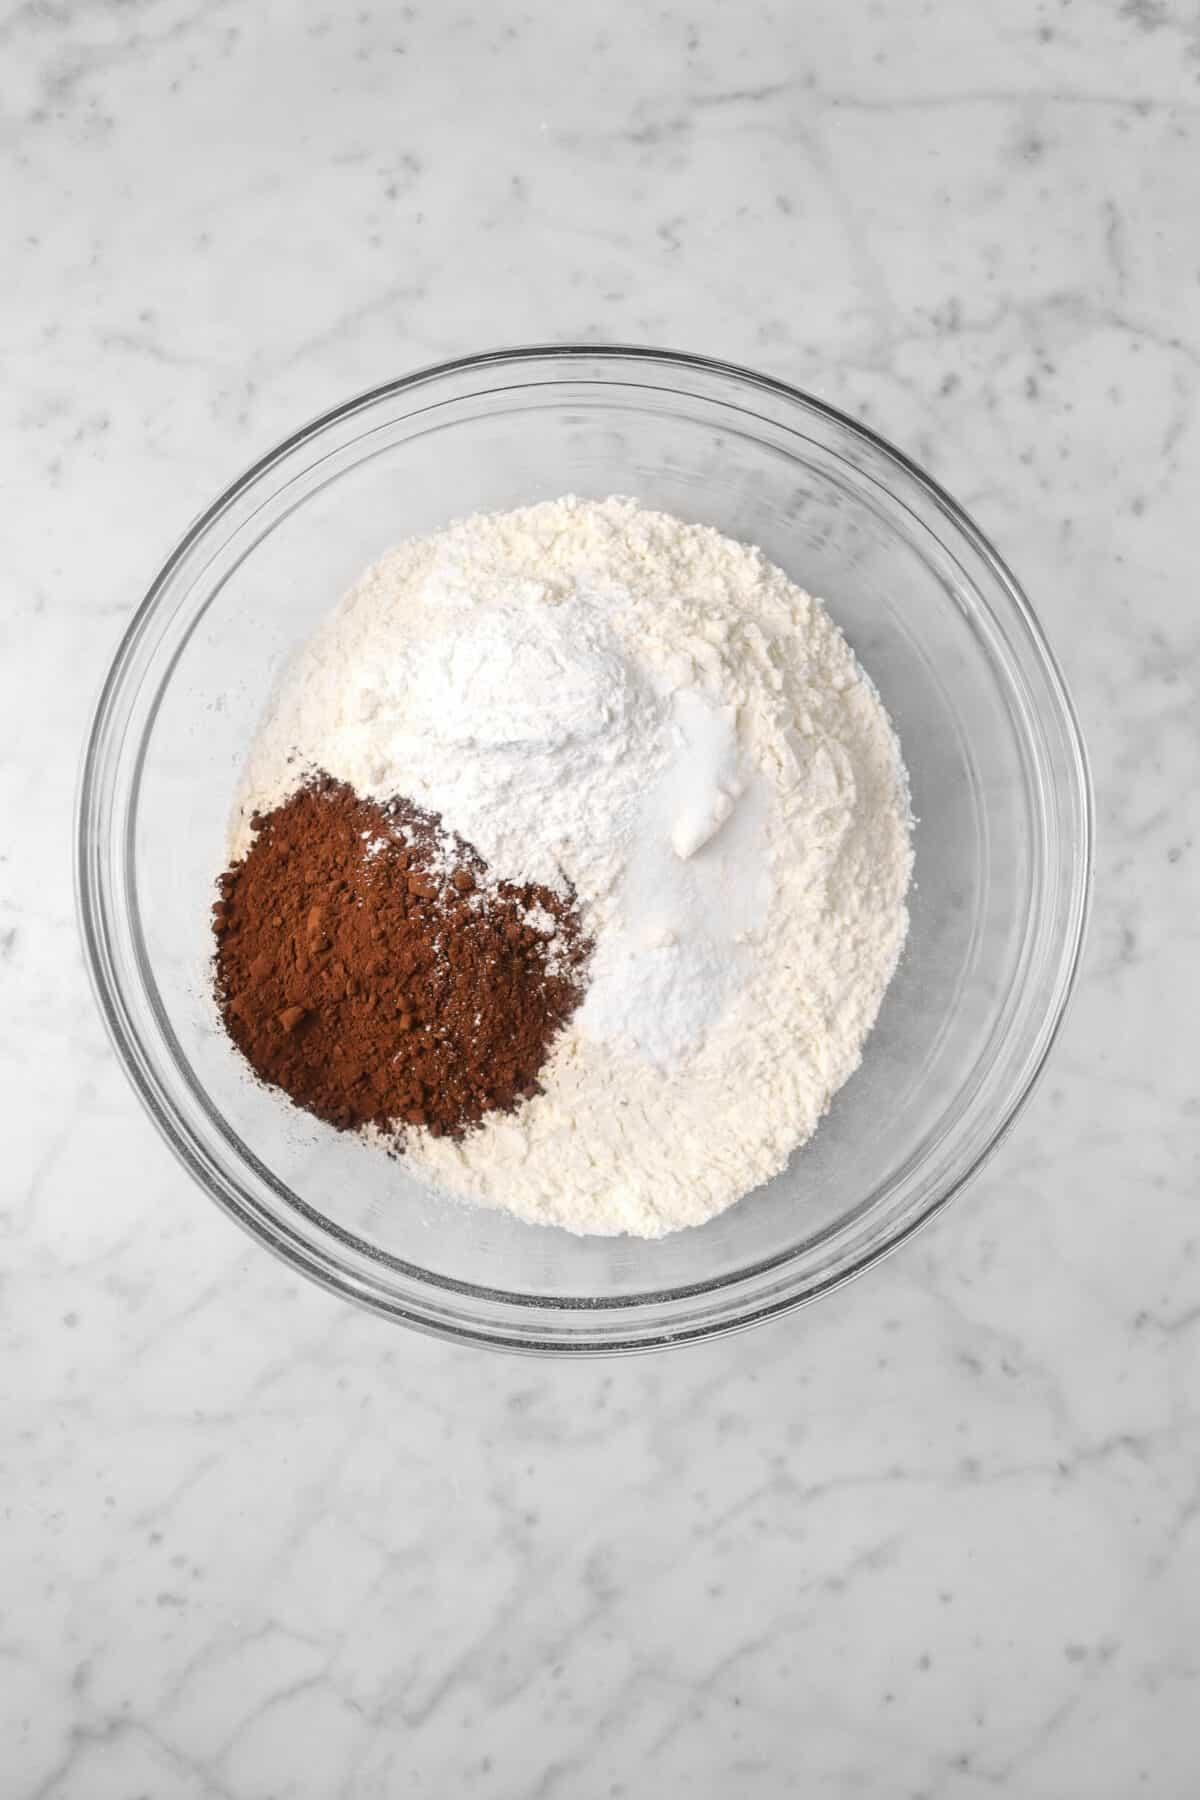 flour, cocoa powder, baking soda, and baking powder in a glass bowl